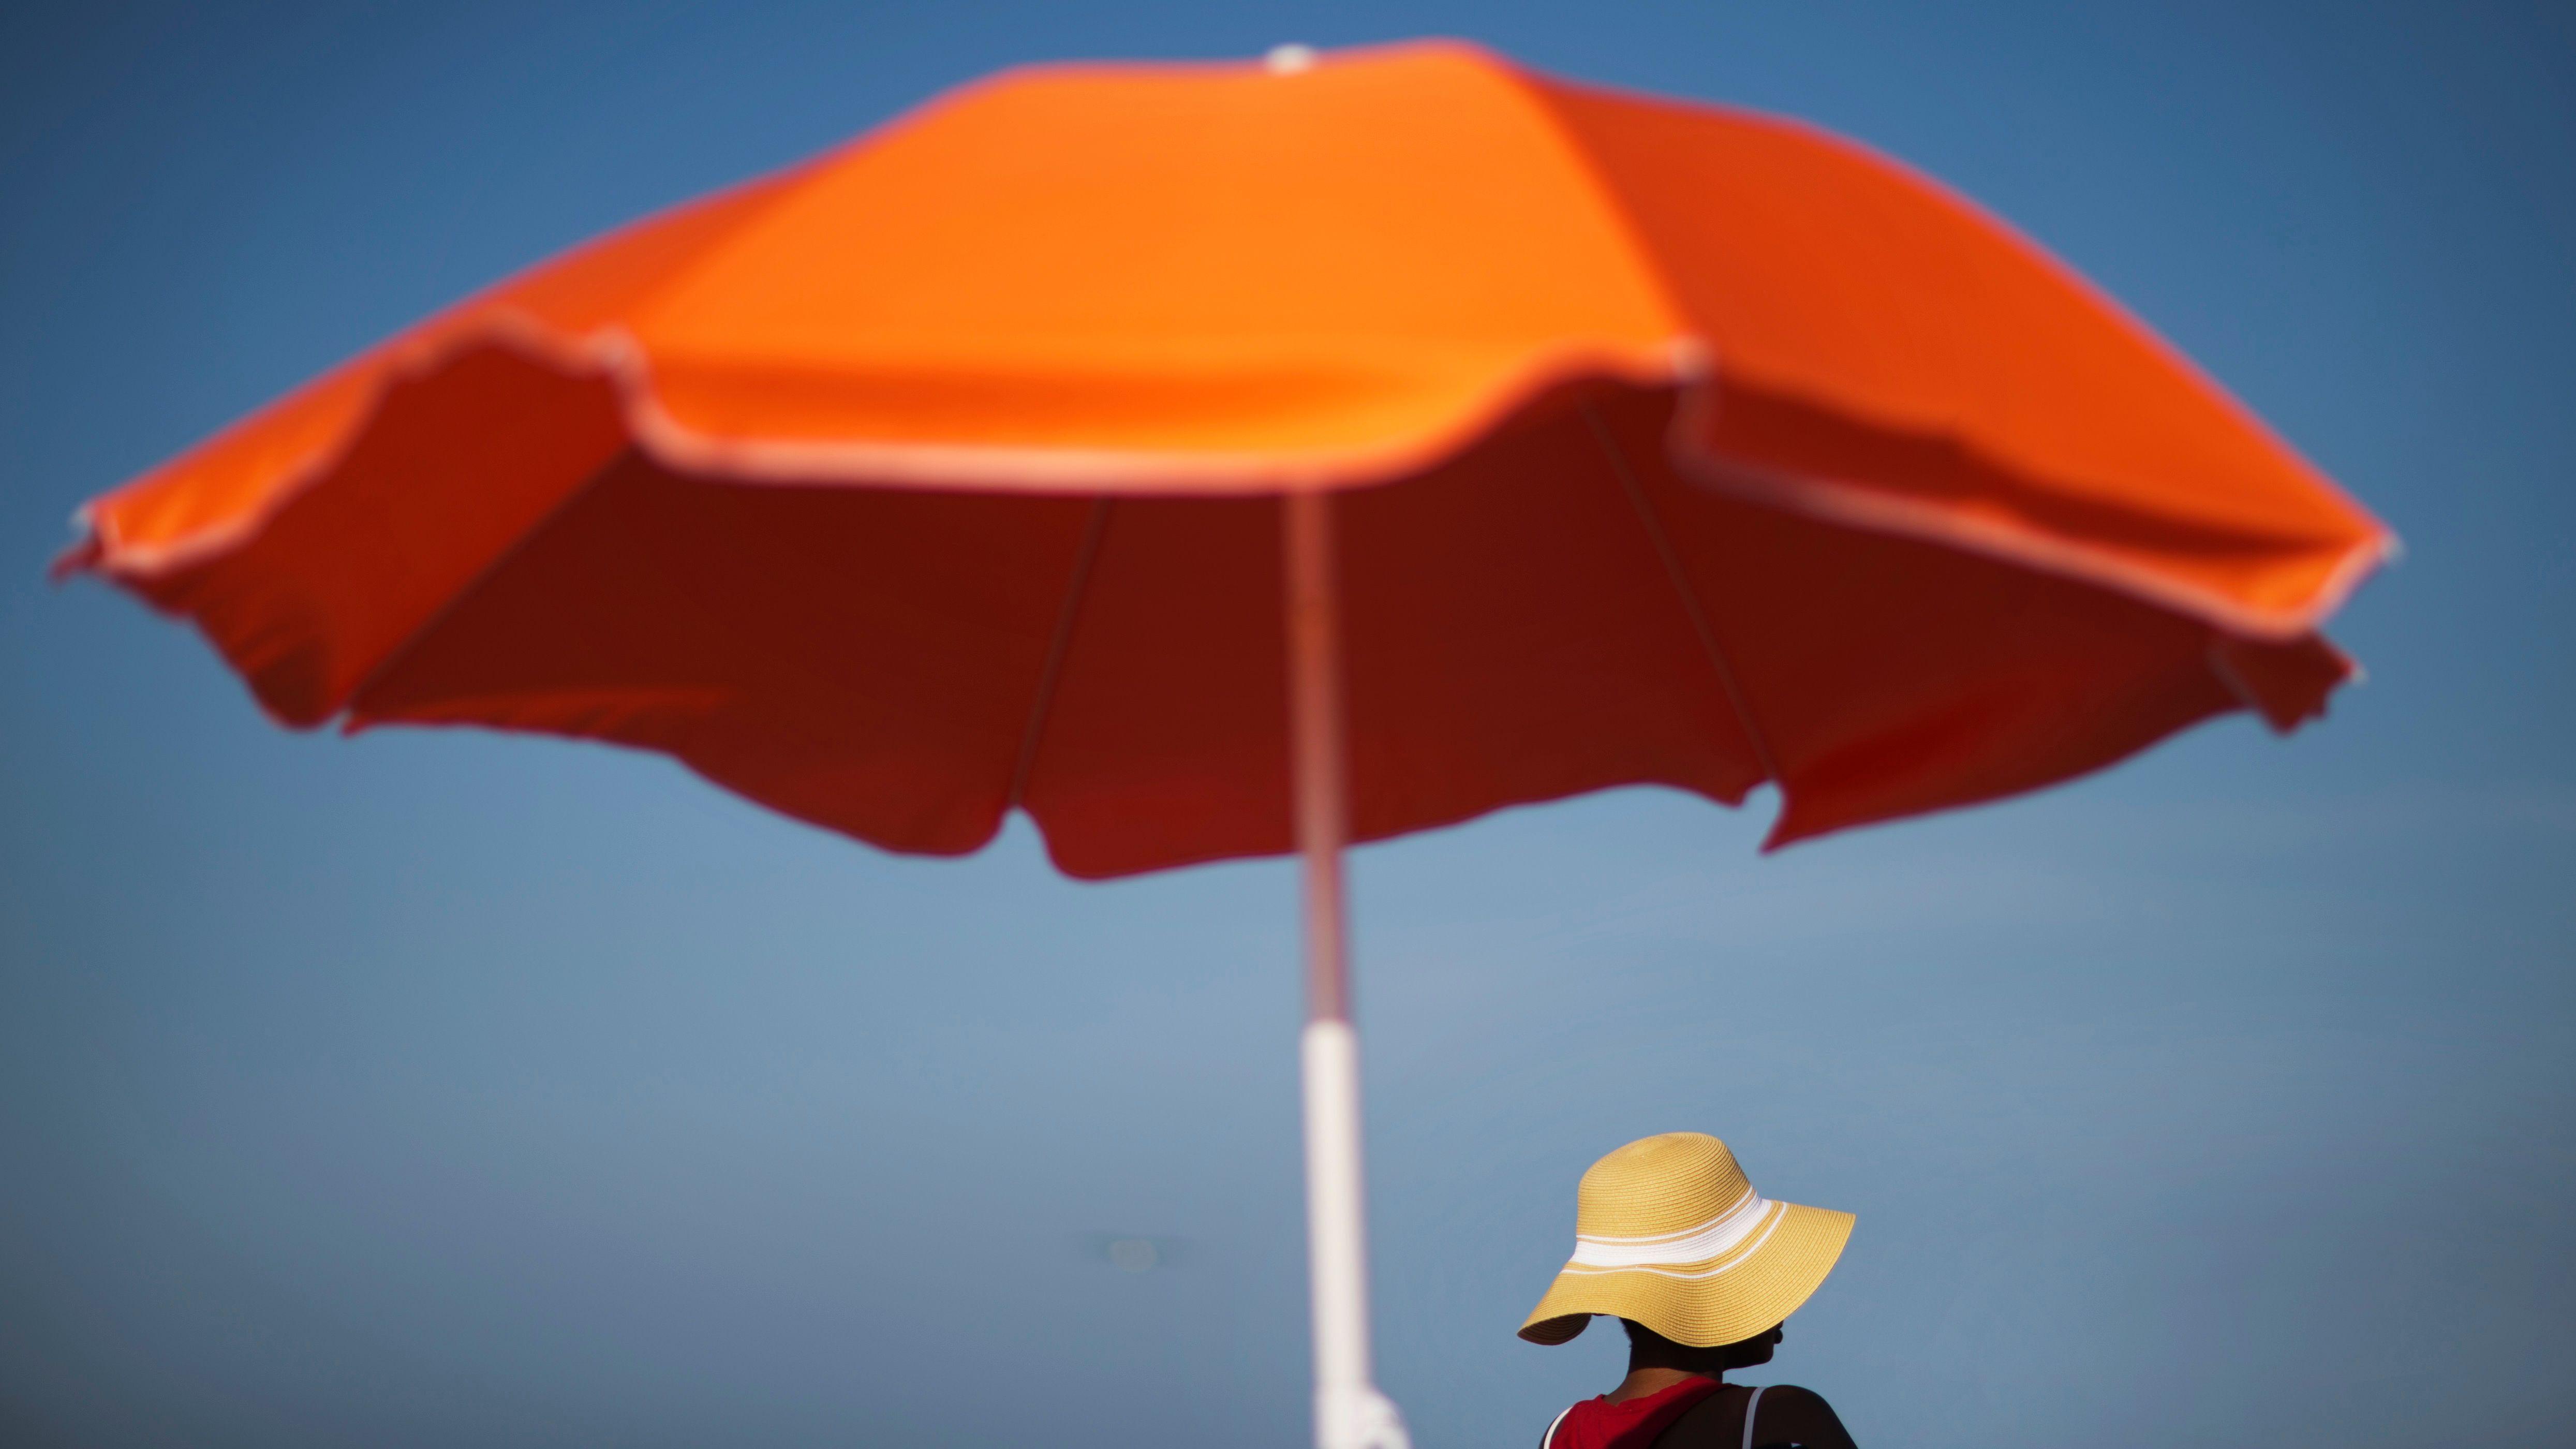 Someone in a brimmed hat sitting under a big orange umbrella